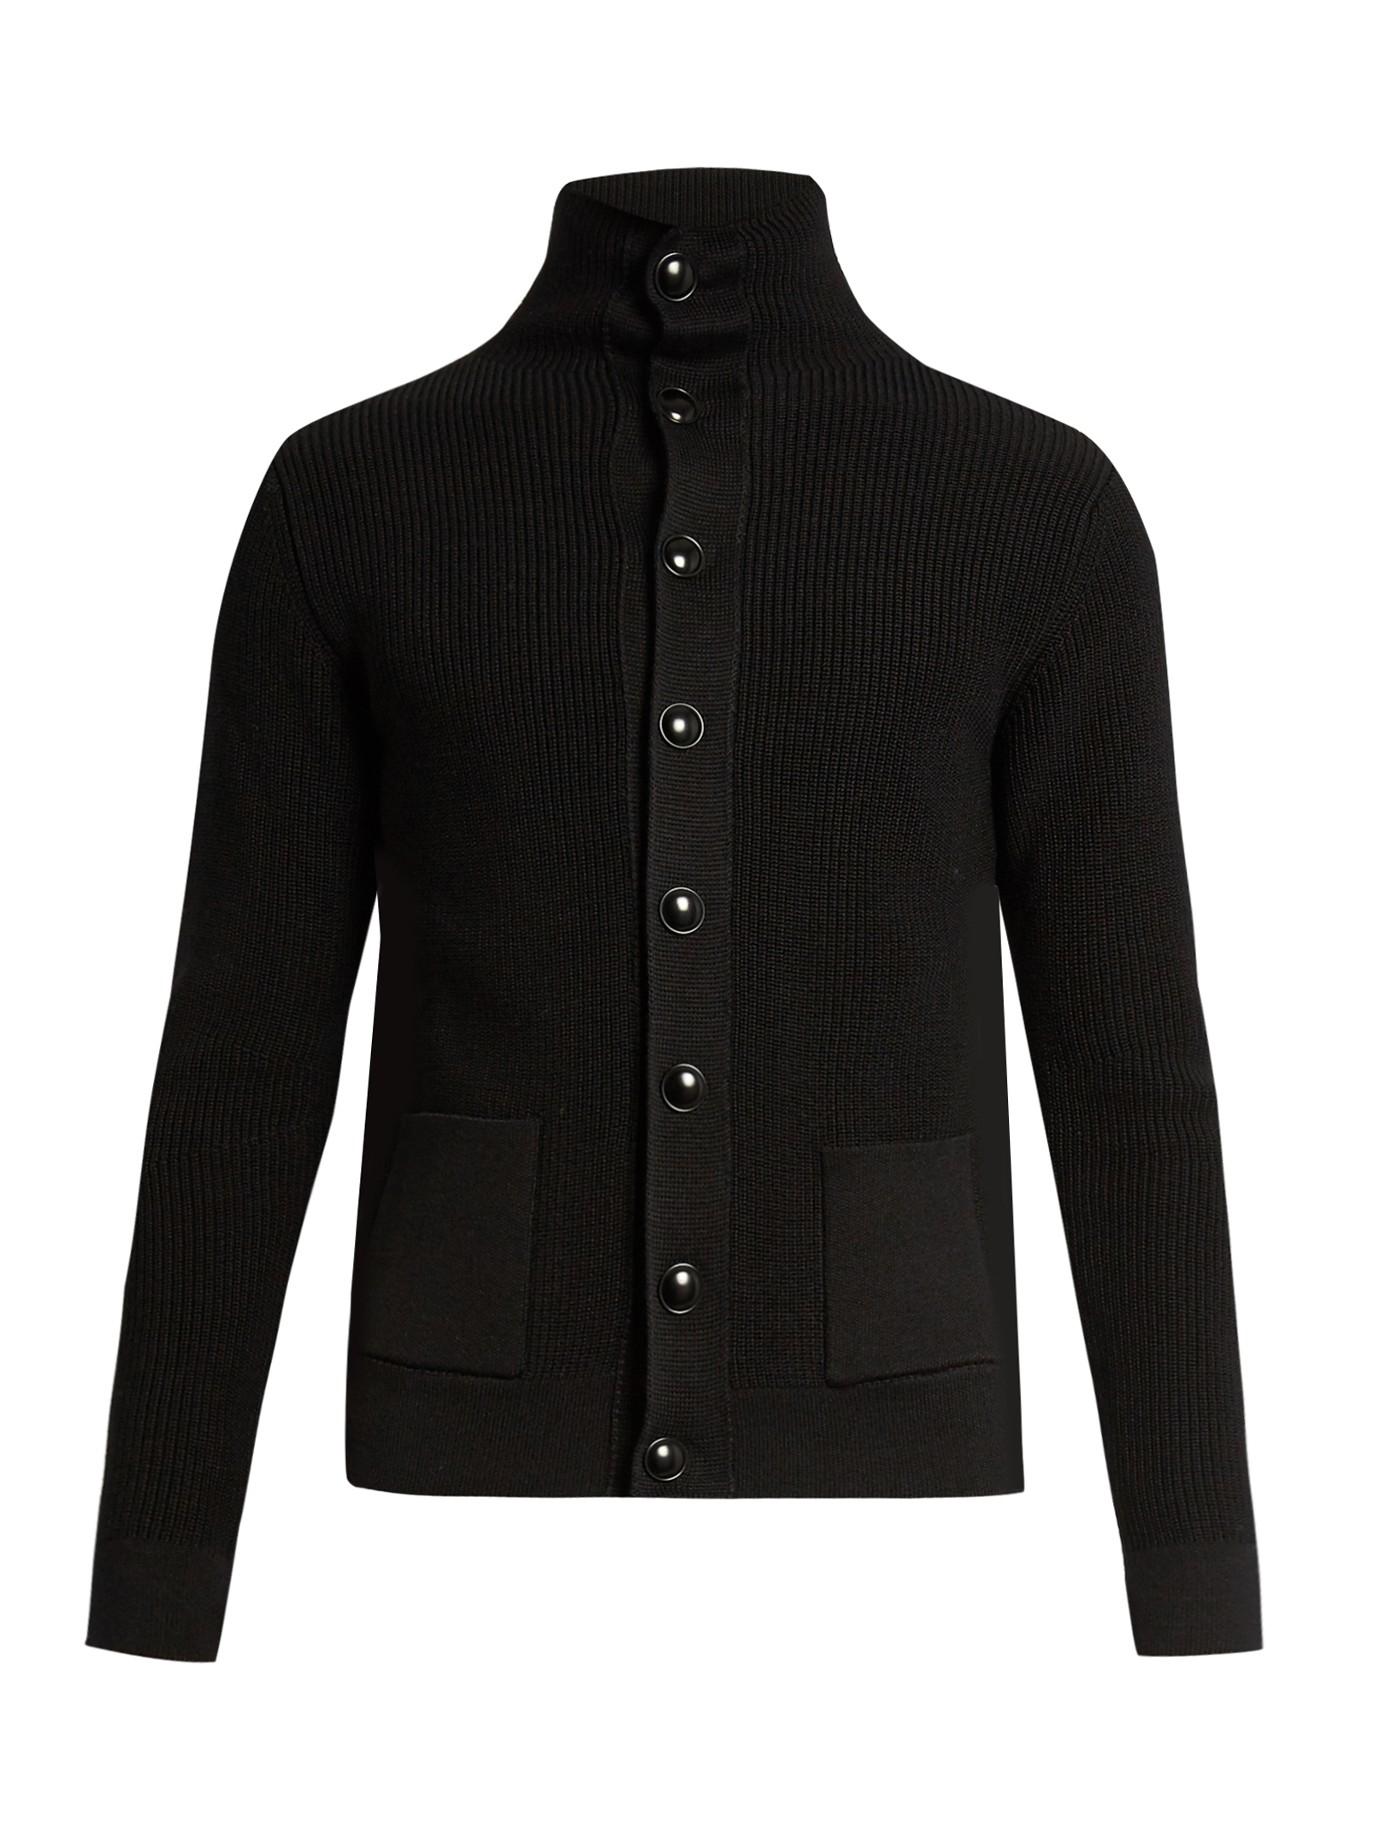 9c948f40a https   www.lyst.com clothing club-monaco-simin-coat-navy-plaid-1 ...